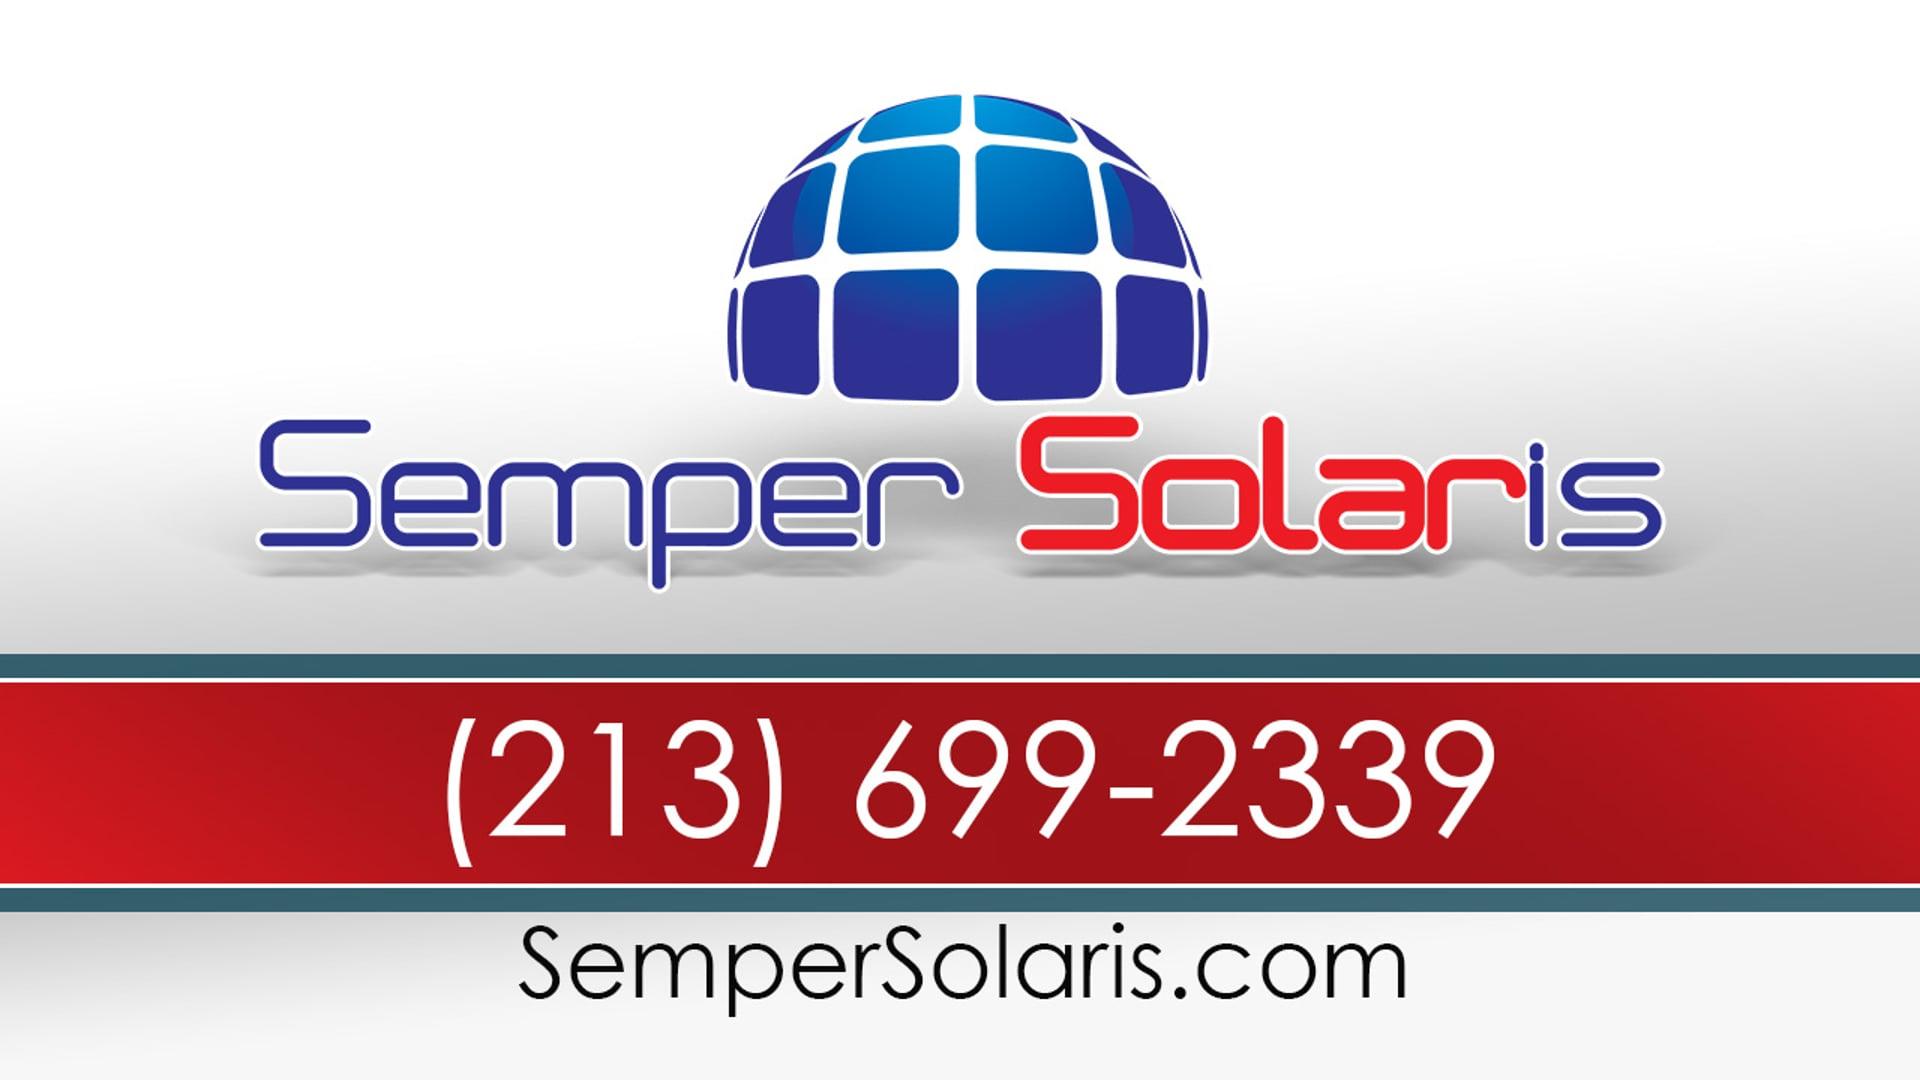 Simi Valley Solar Install Company | Semper Solaris | (213) 699-2339